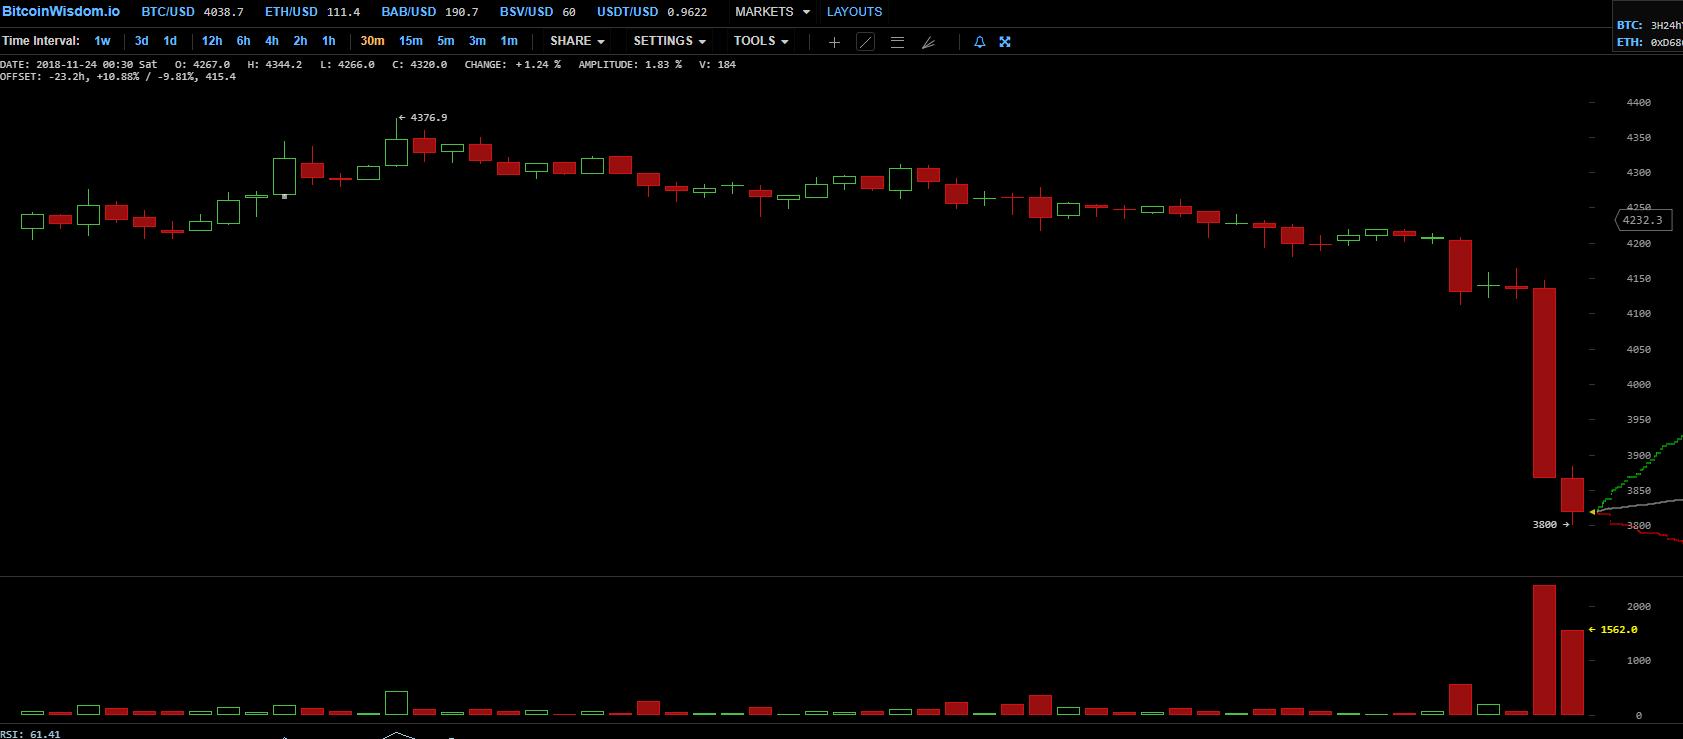 Цена биткоина упала ниже 00